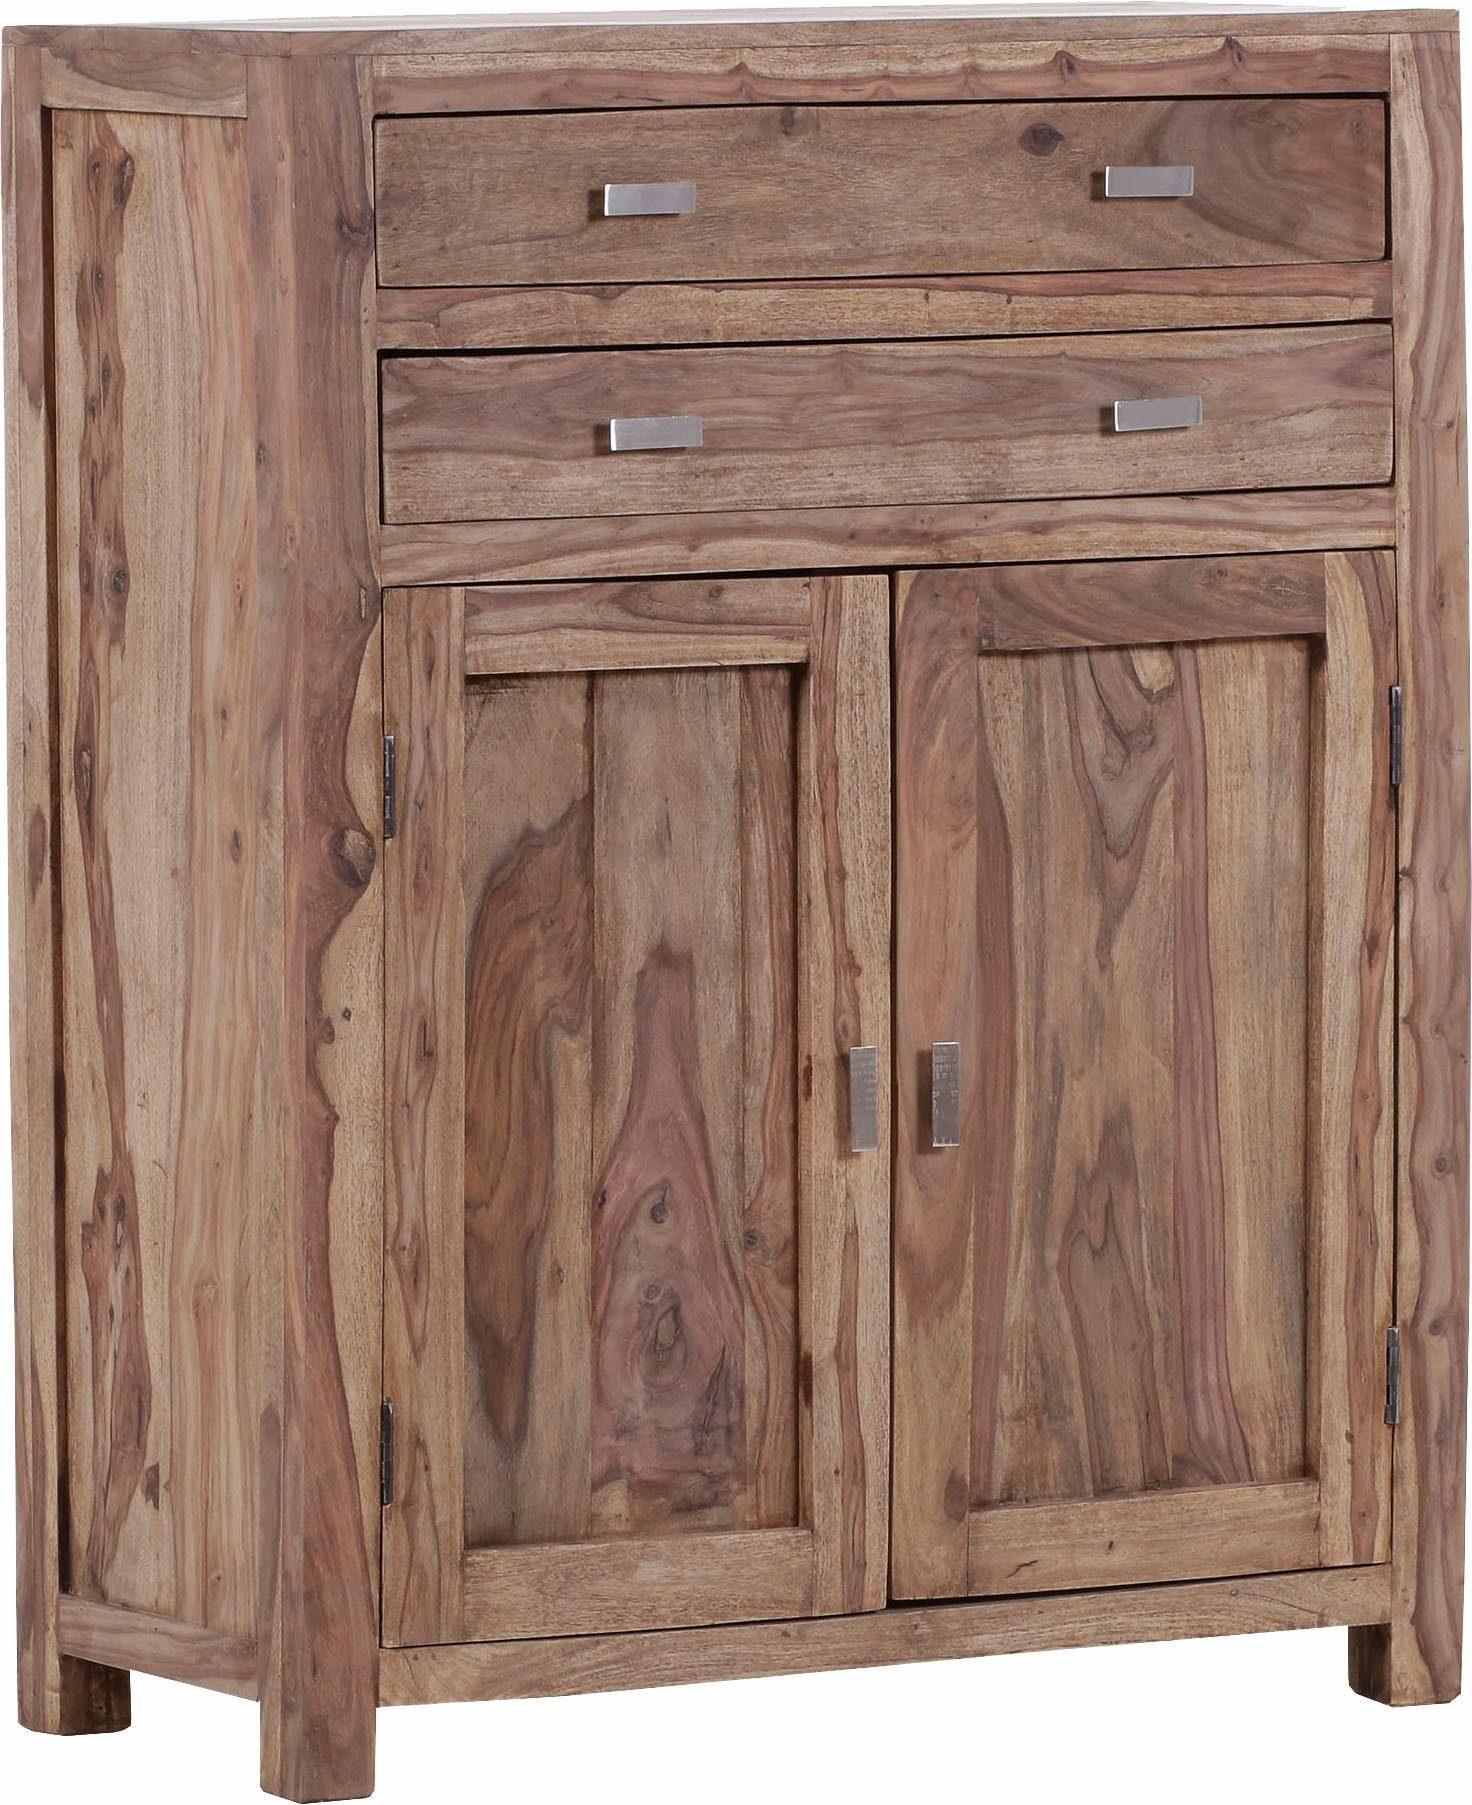 Gutmann Factory Kommode »Inka« aus massivem Sheesham Holz, Breite 90 cm